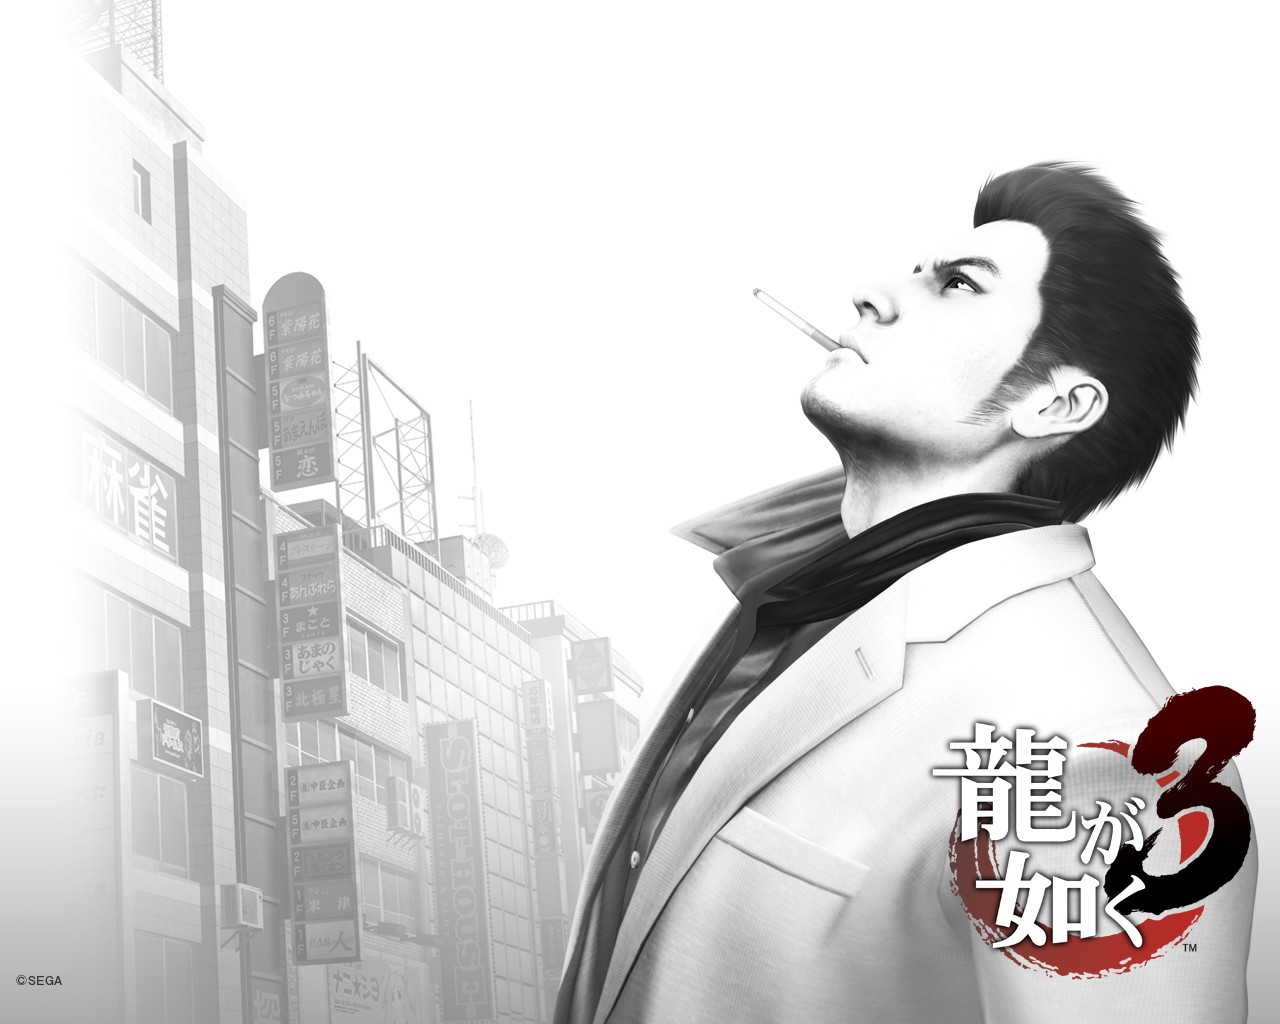 http://www.videogamesblogger.com/wp-content/uploads/2010/01/yakuza-3-wallpaper.jpg